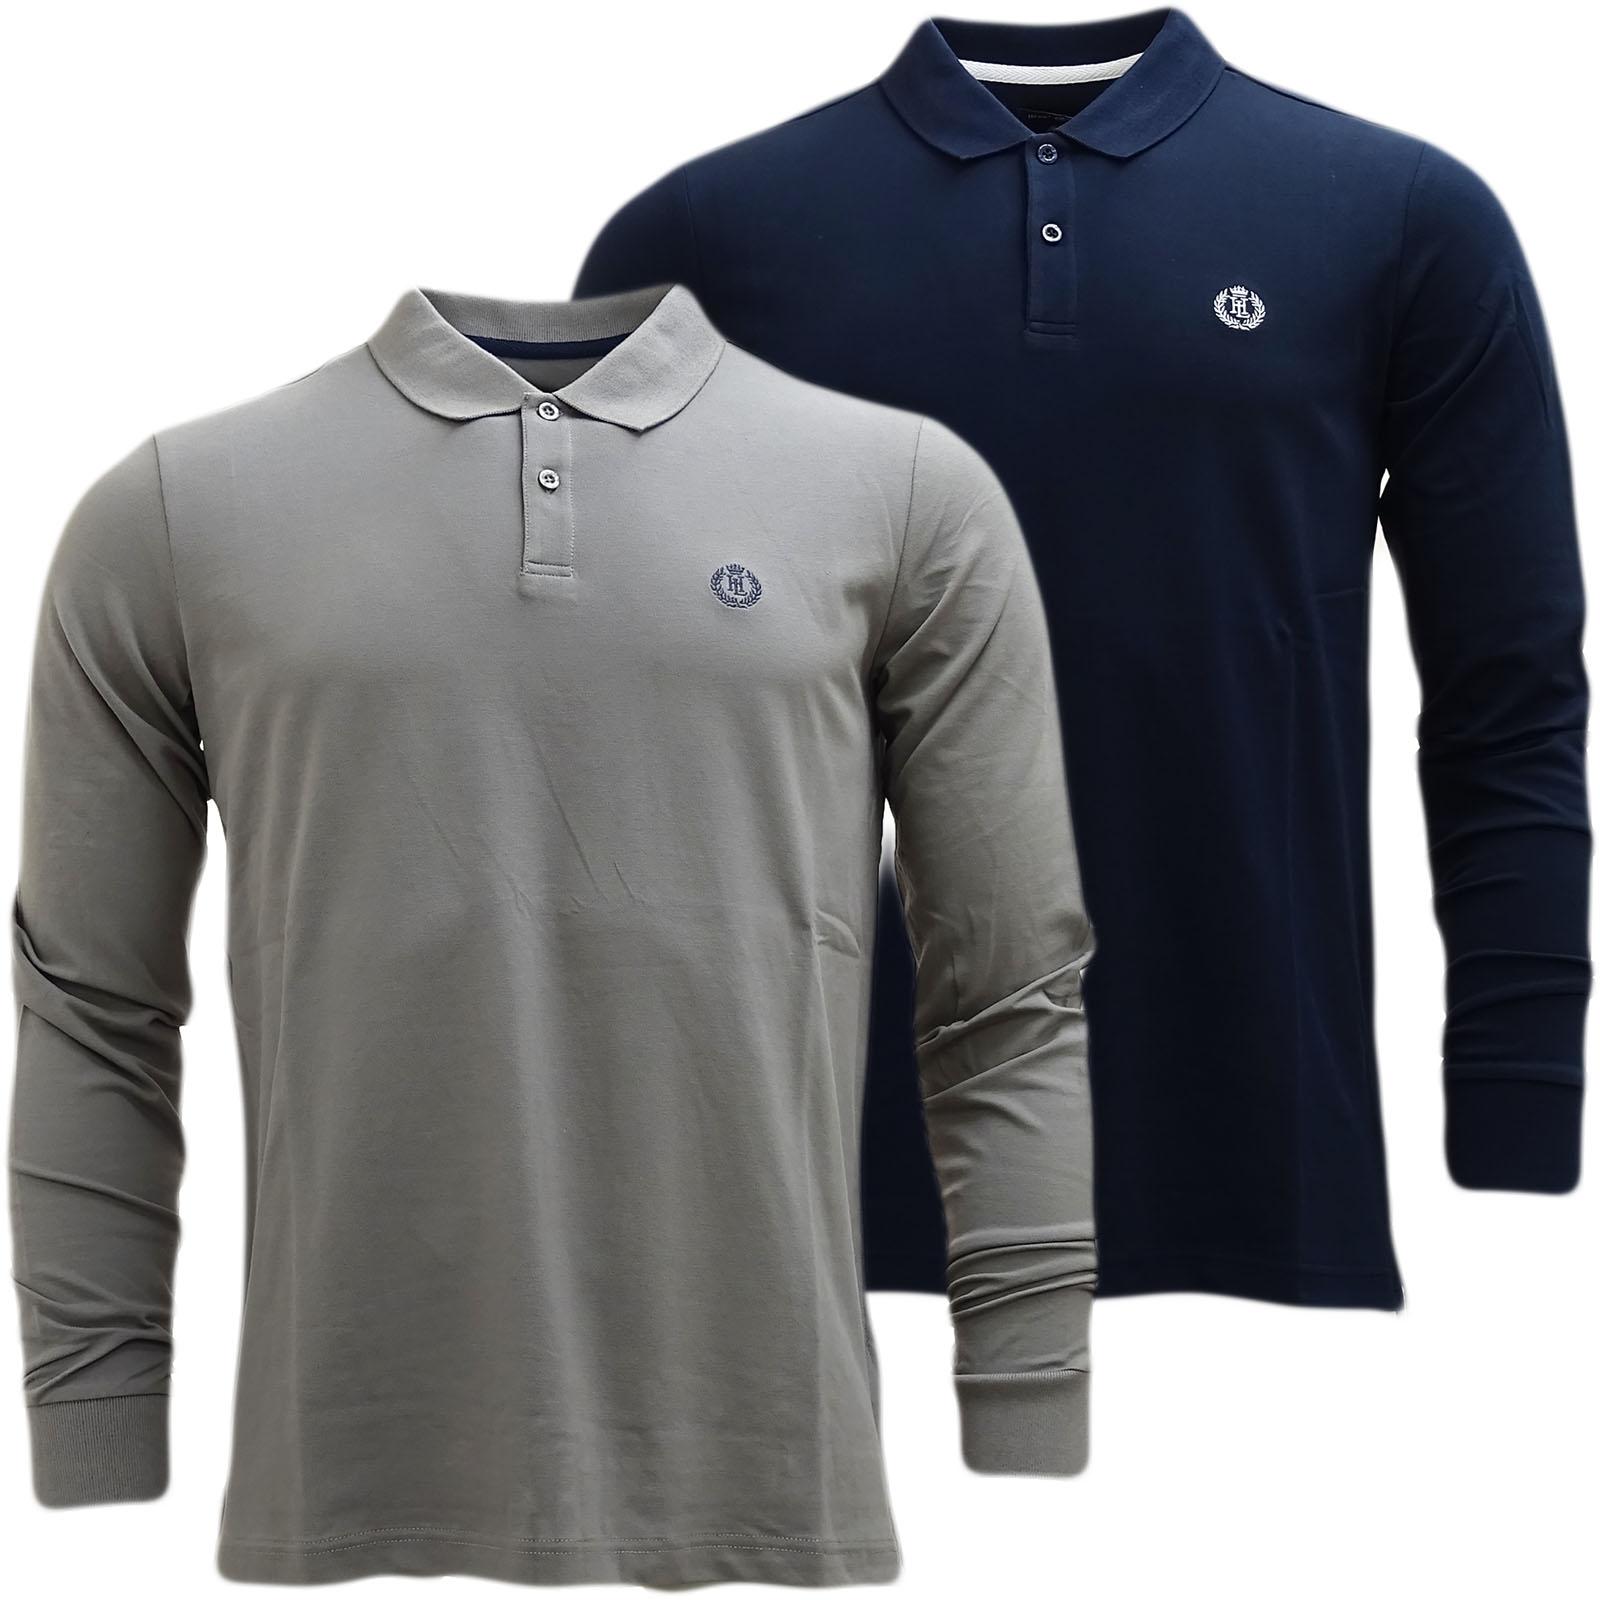 60dd5a27ab9 Sentinel Mens Long Sleeve Polo Shirts by Henri Lloyd (Musburry)